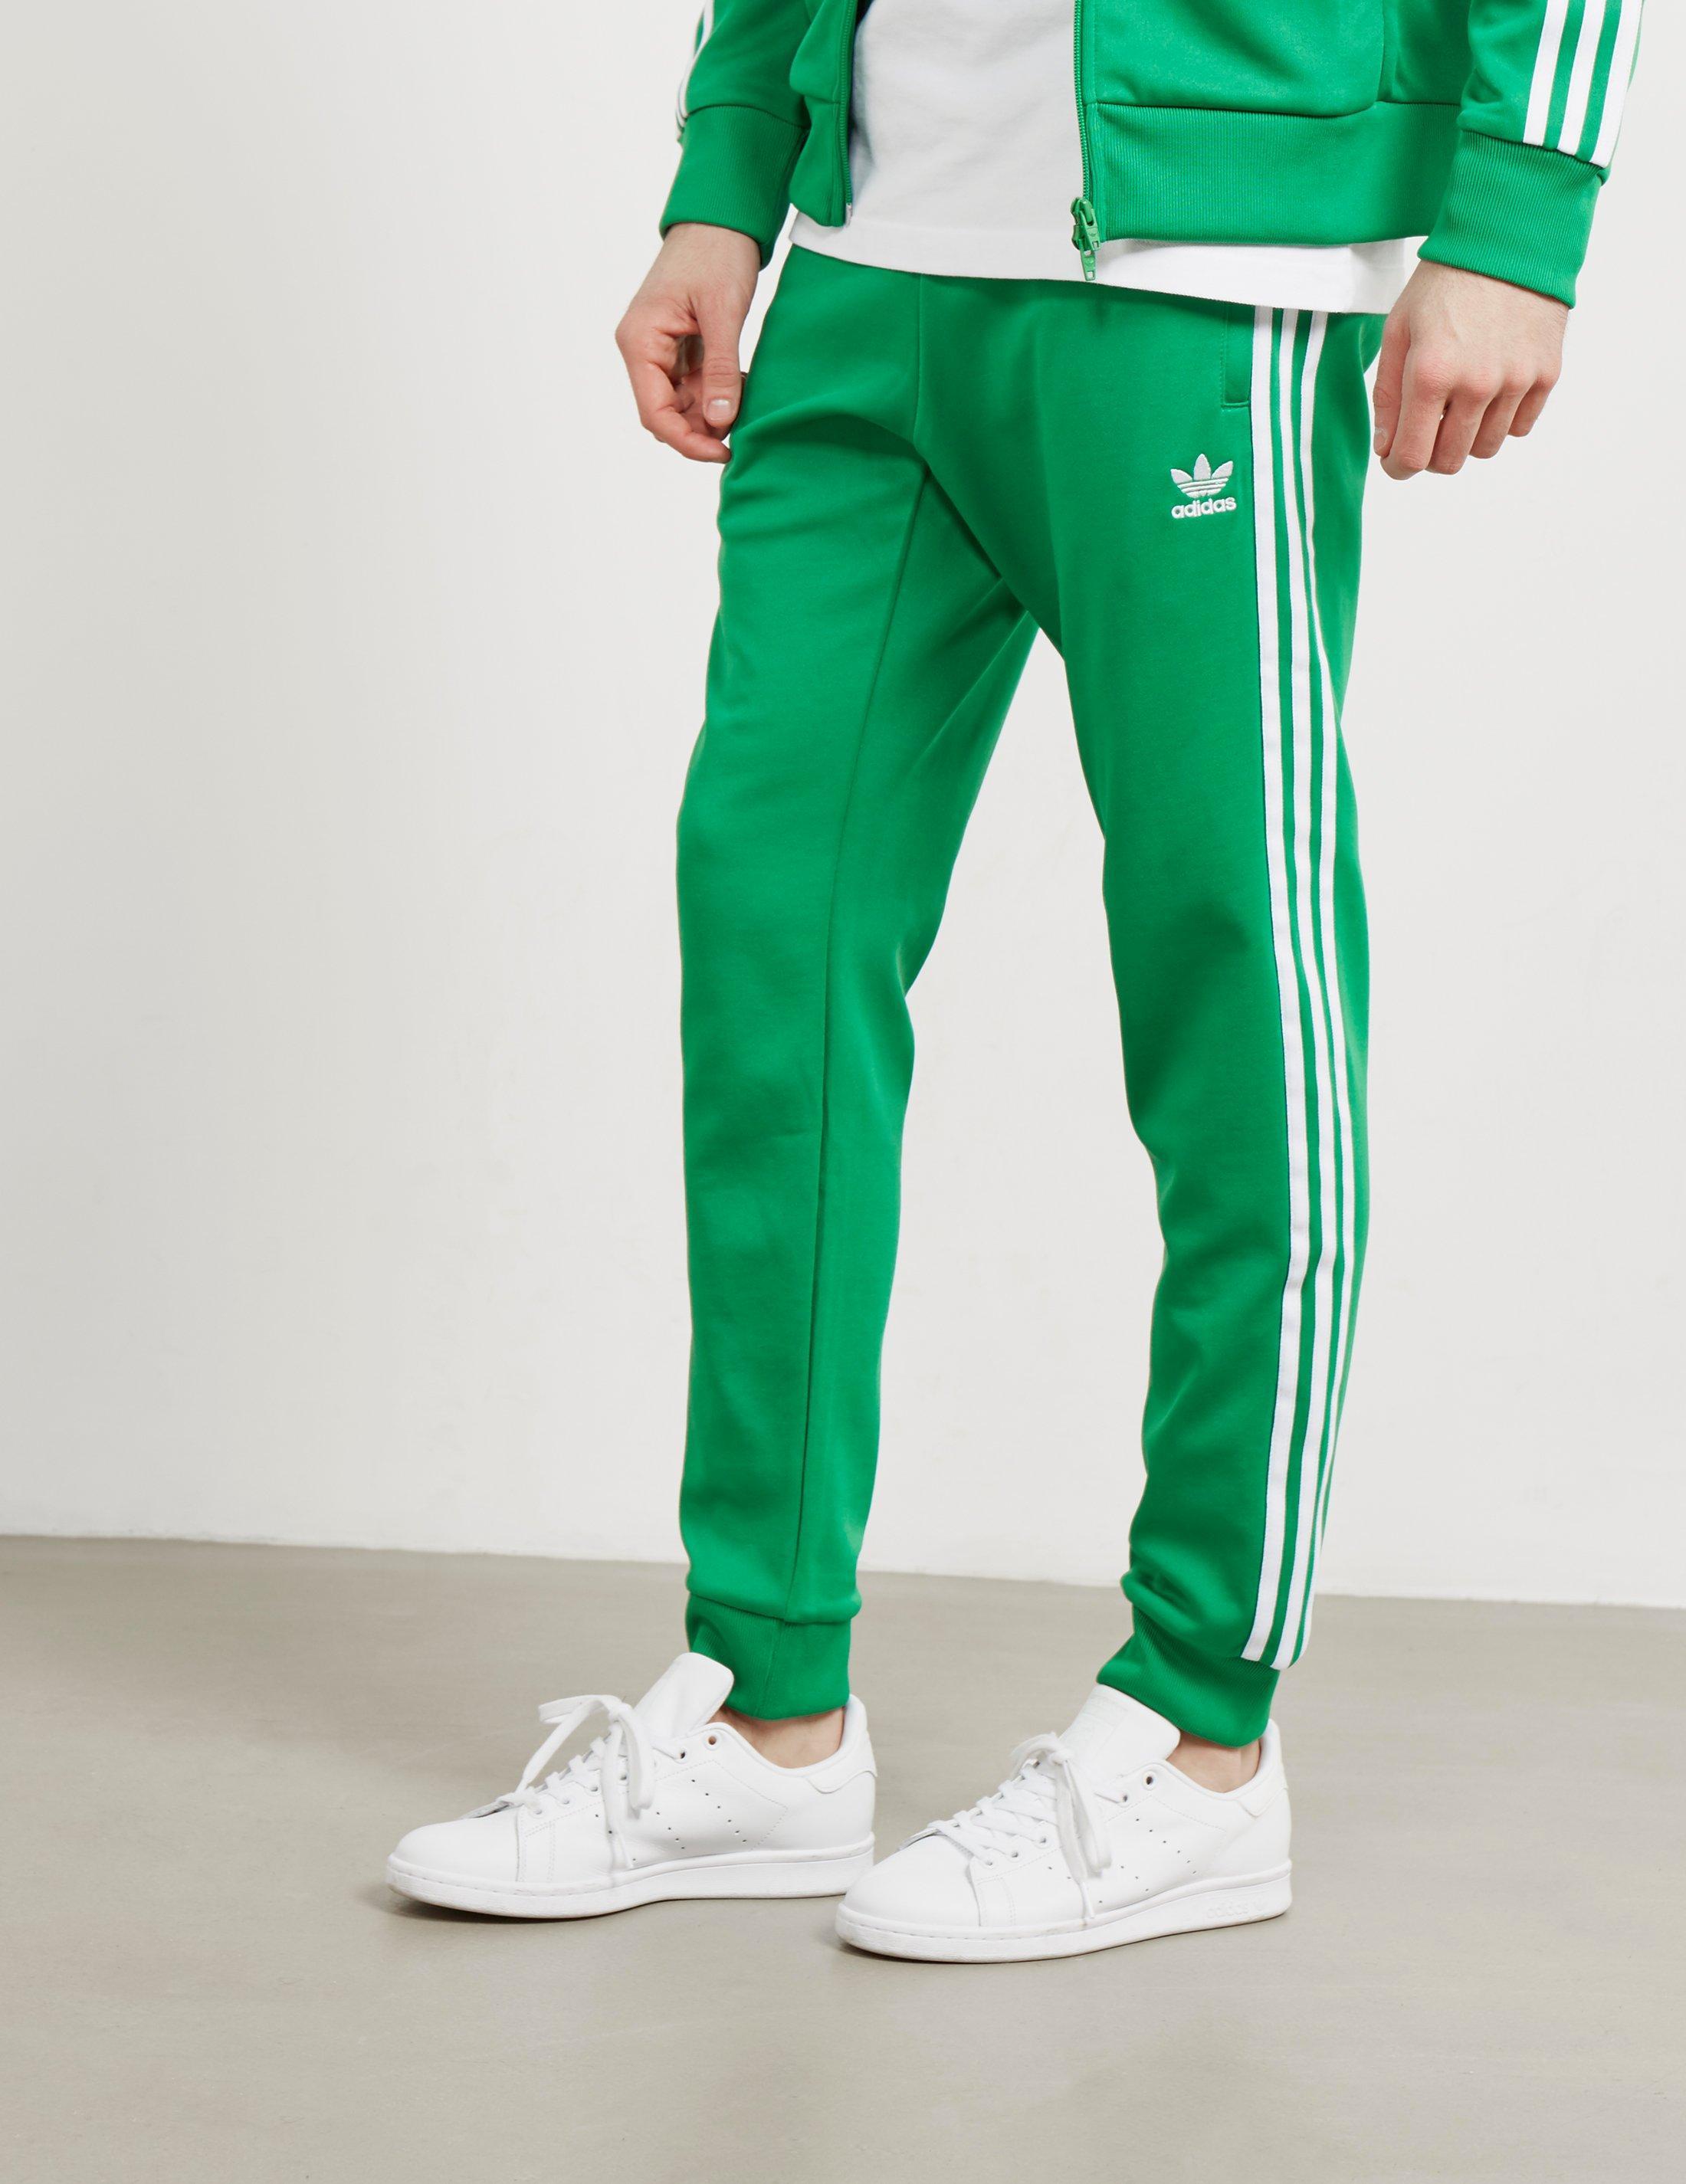 official photos ce868 5cbb3 Lyst Adidas Originals Mens Mens Superstar Adidas Pantalones verde verde en  verde 5f540af - www.vreale.online